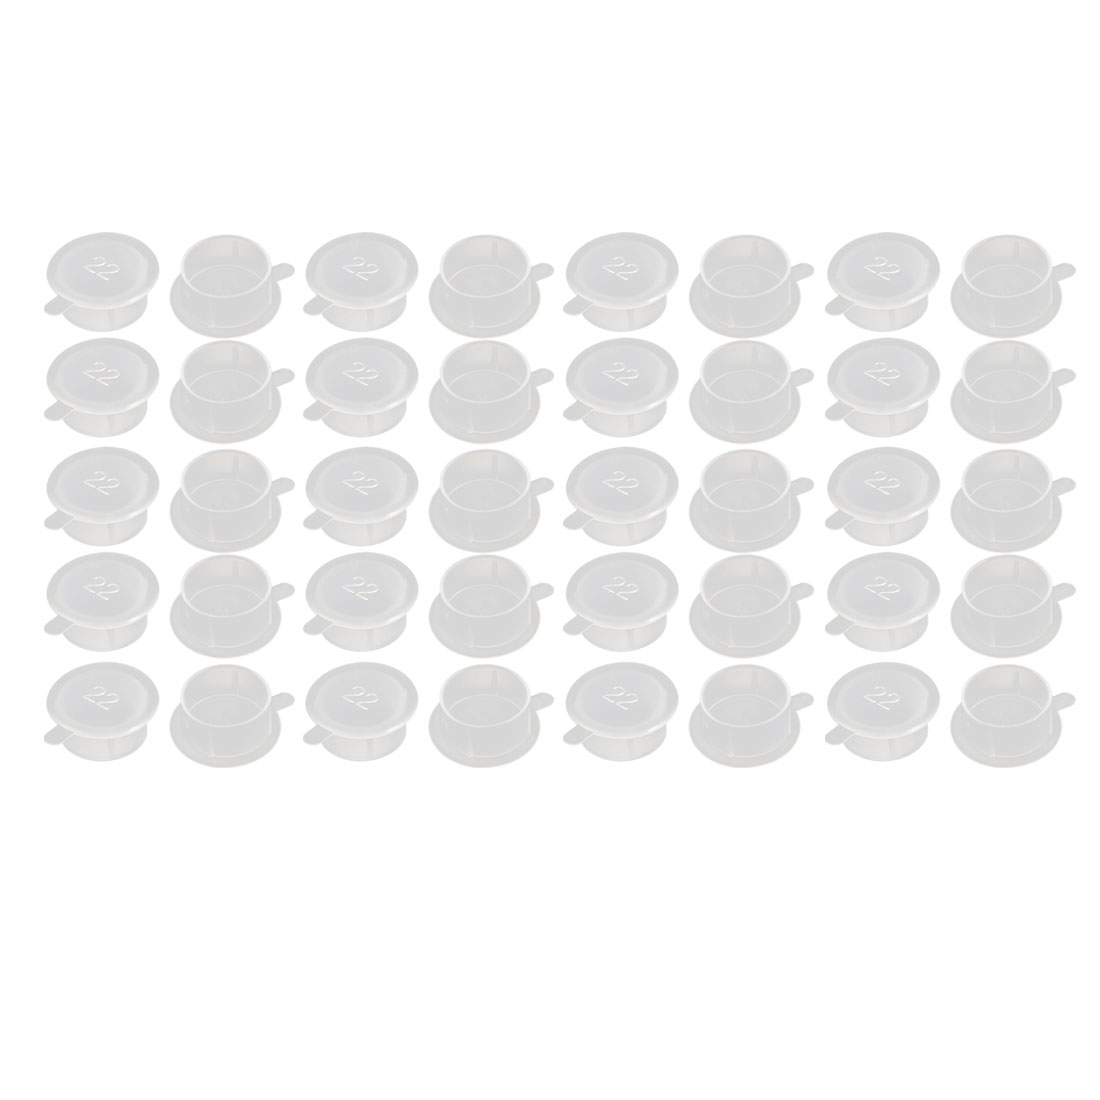 40pcs M22 PE Flat Blanking End Tube Insert Cap Round Cover Transparent